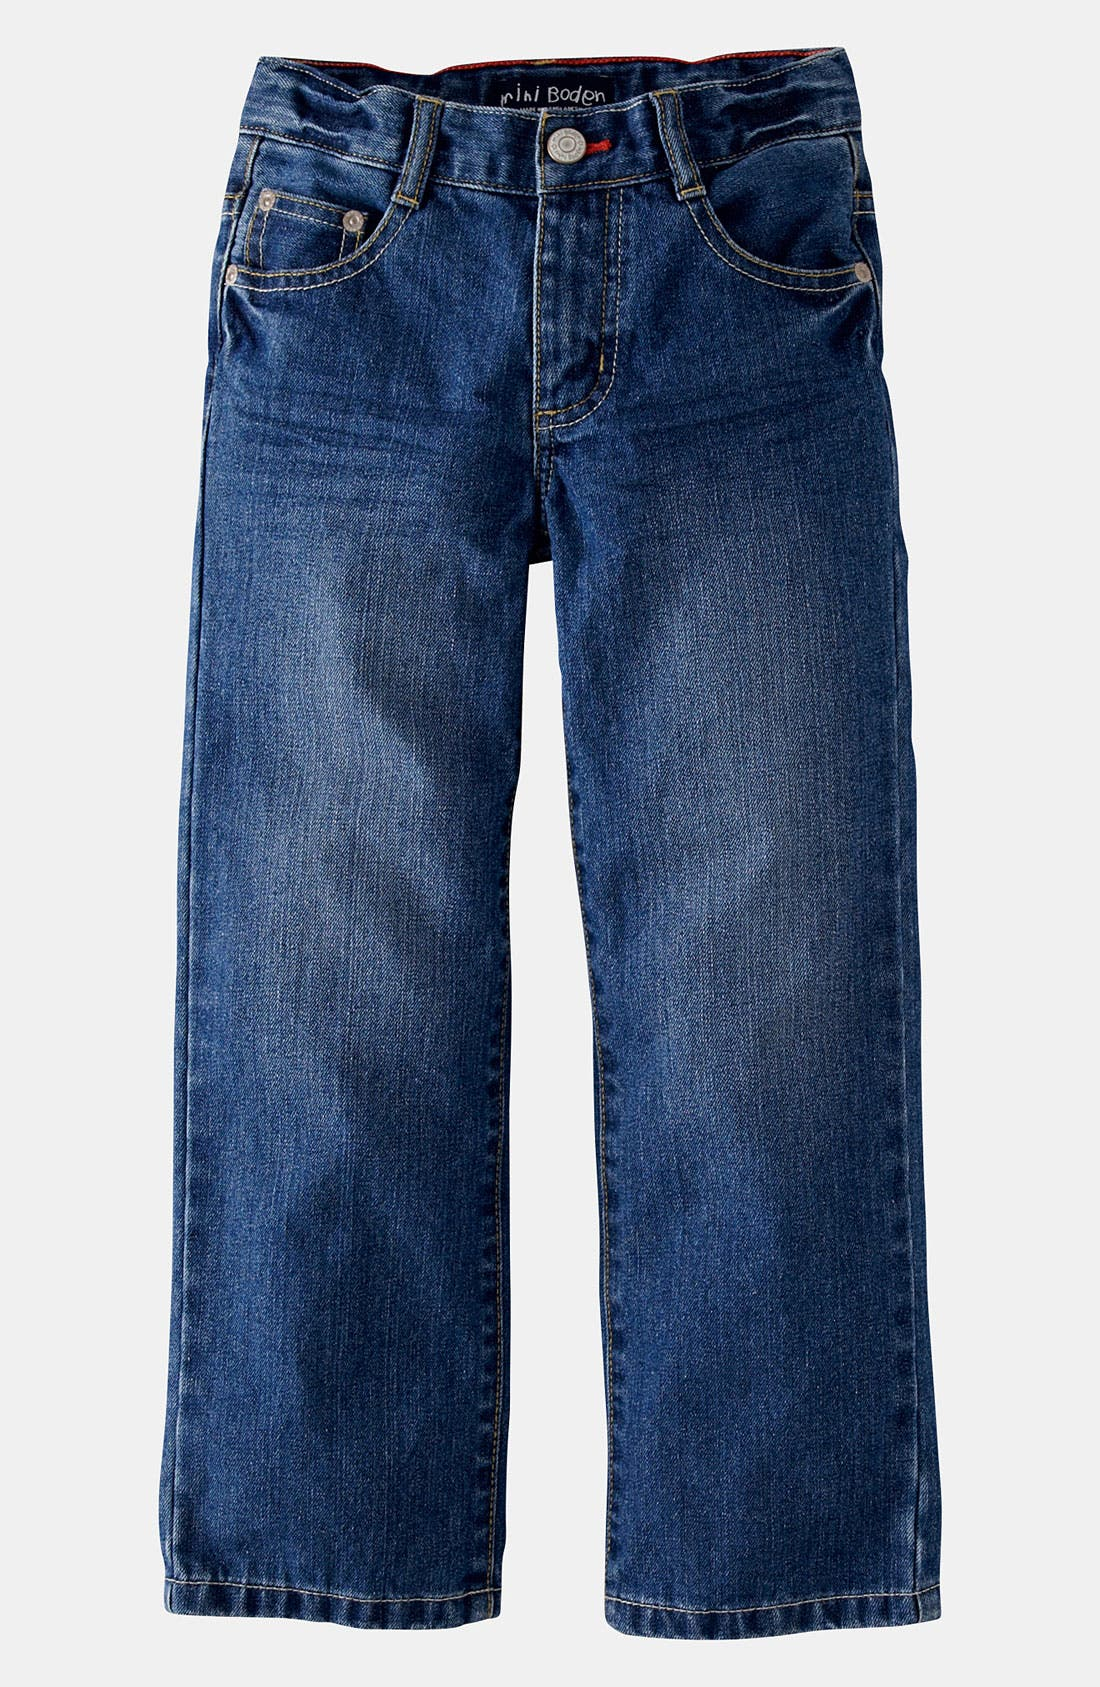 Alternate Image 1 Selected - Mini Boden Regular Fit Jeans (Toddler)